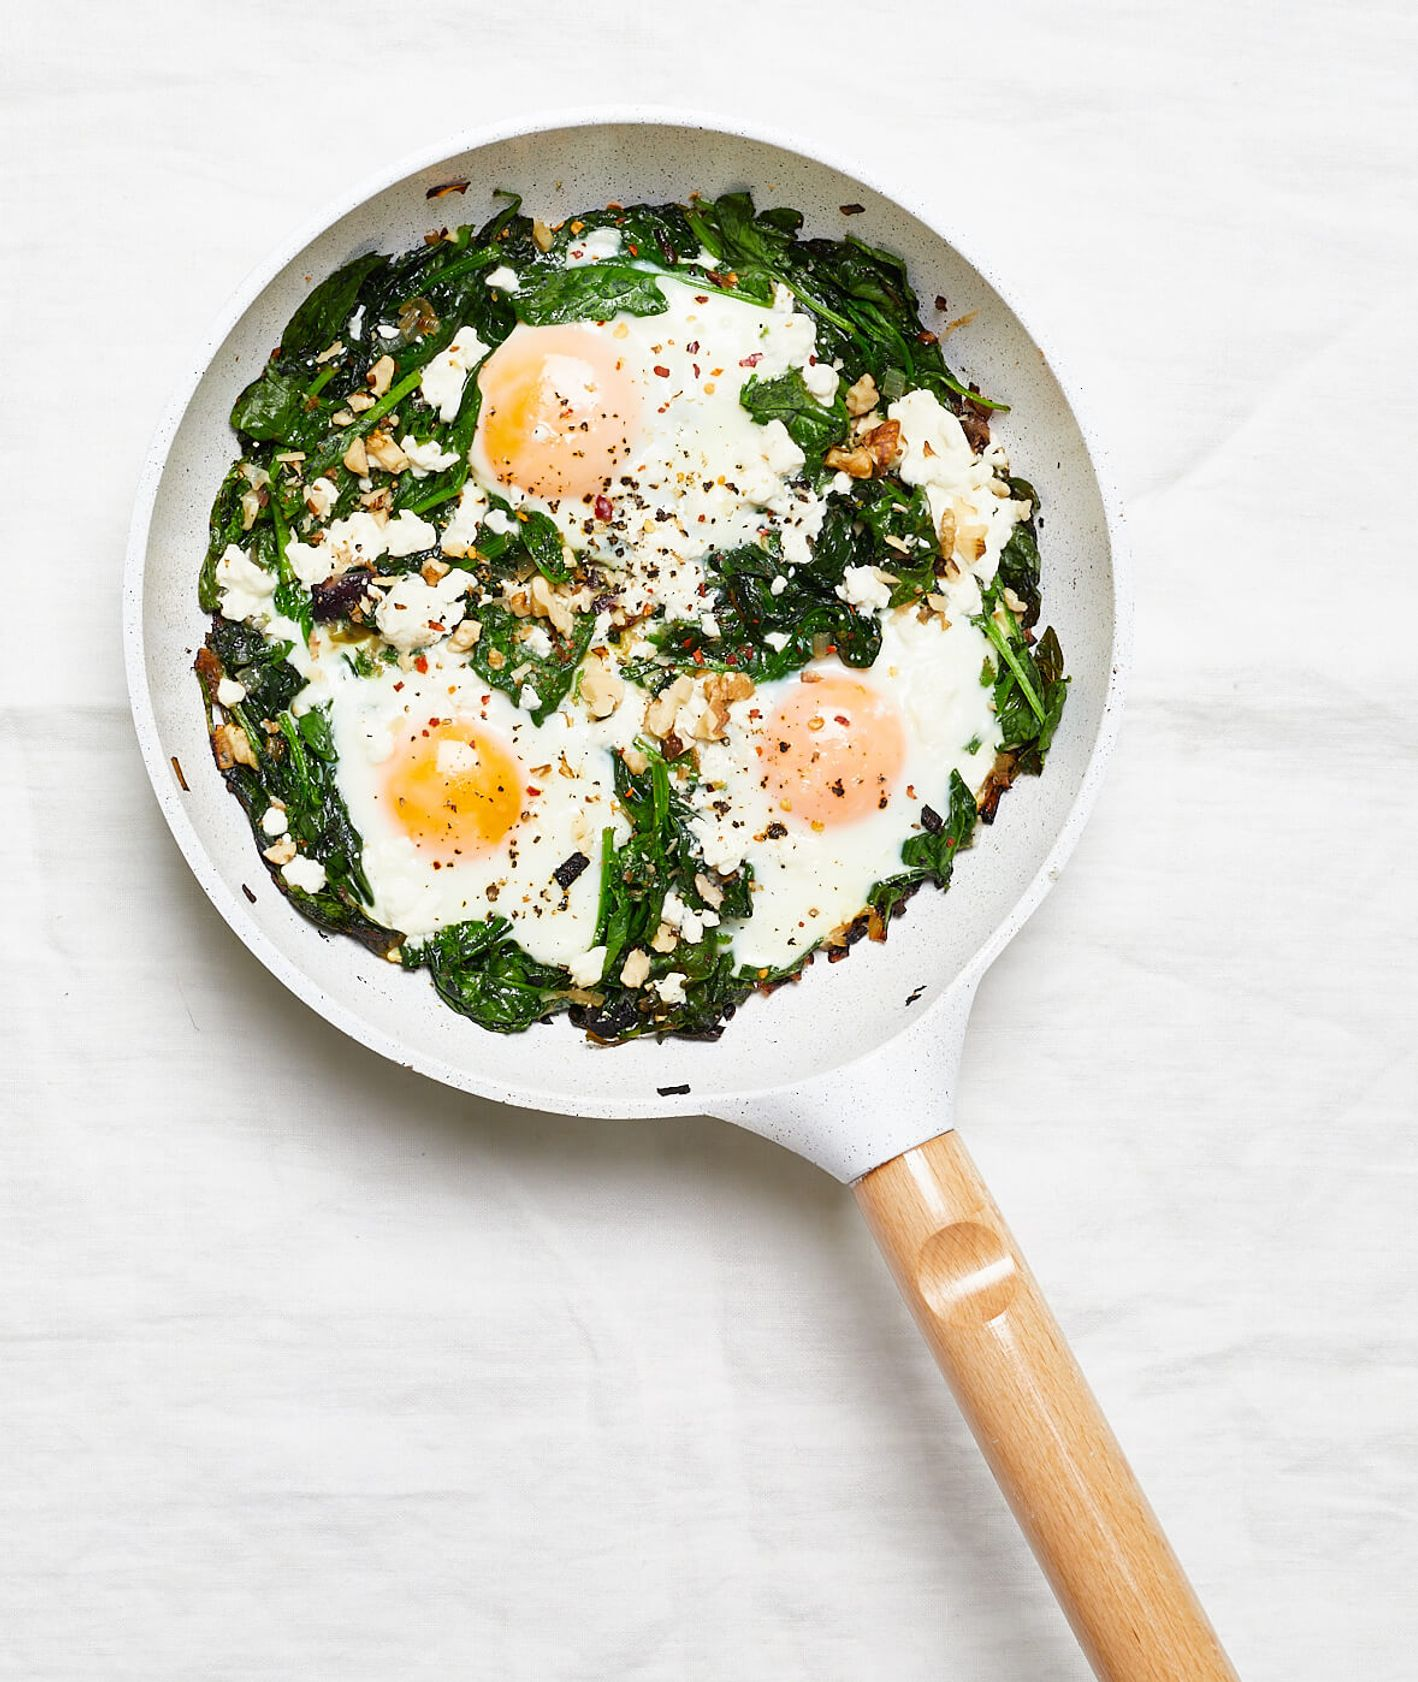 szakszuka, zielona szakszuka, szakszuka ze szpinakiem, jajka ze szpinakiem, szpinak, wytrawne śniadanie, zdrowe śniadanie, jajka na śniadanie, leniwe śniadanie